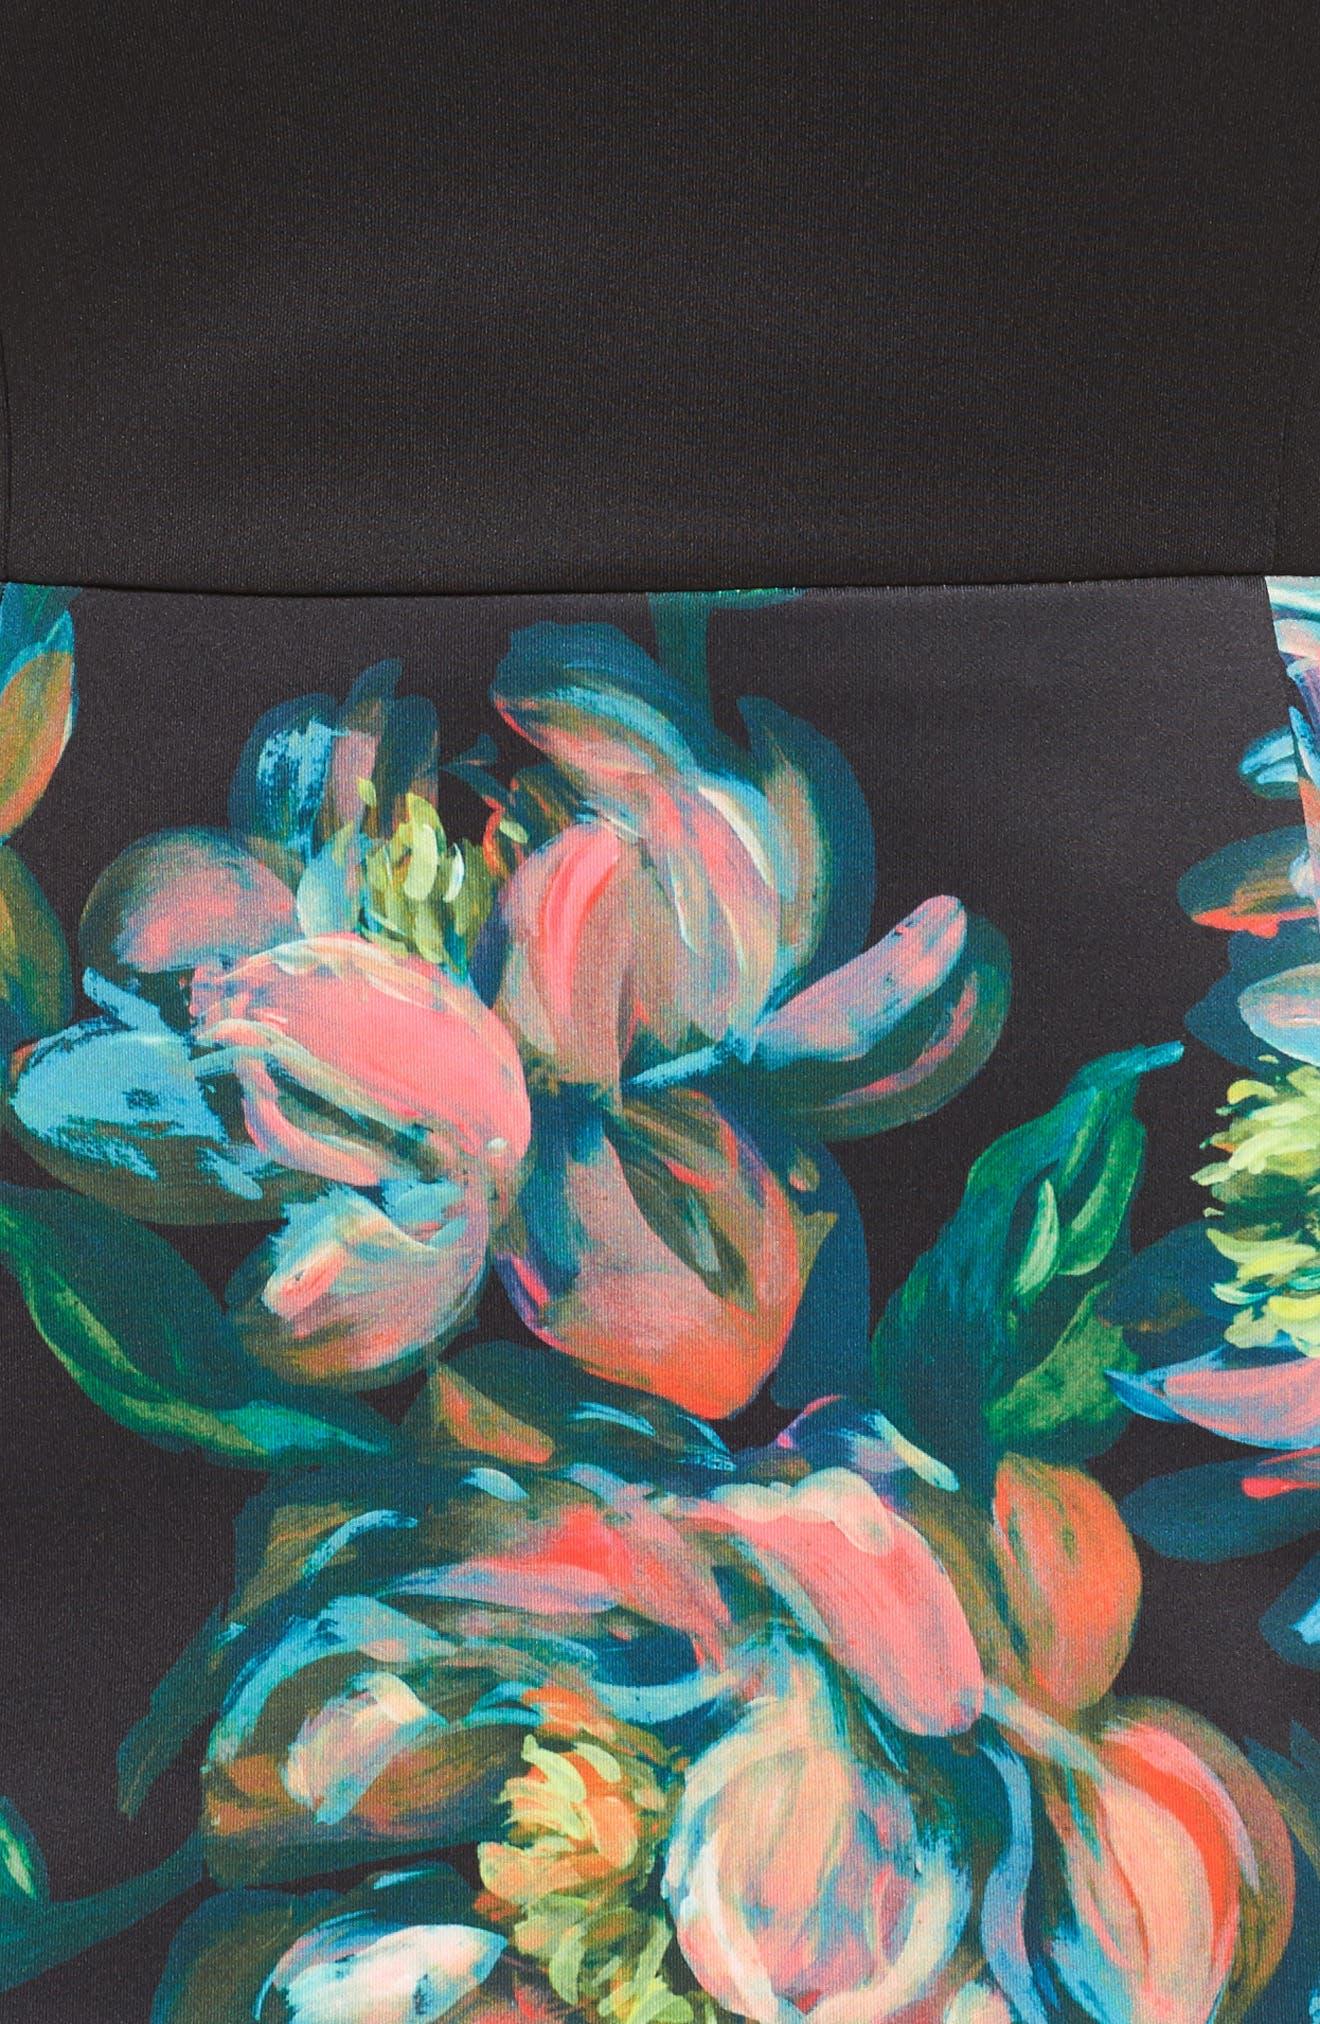 Floral Print Sheath Dress,                             Alternate thumbnail 5, color,